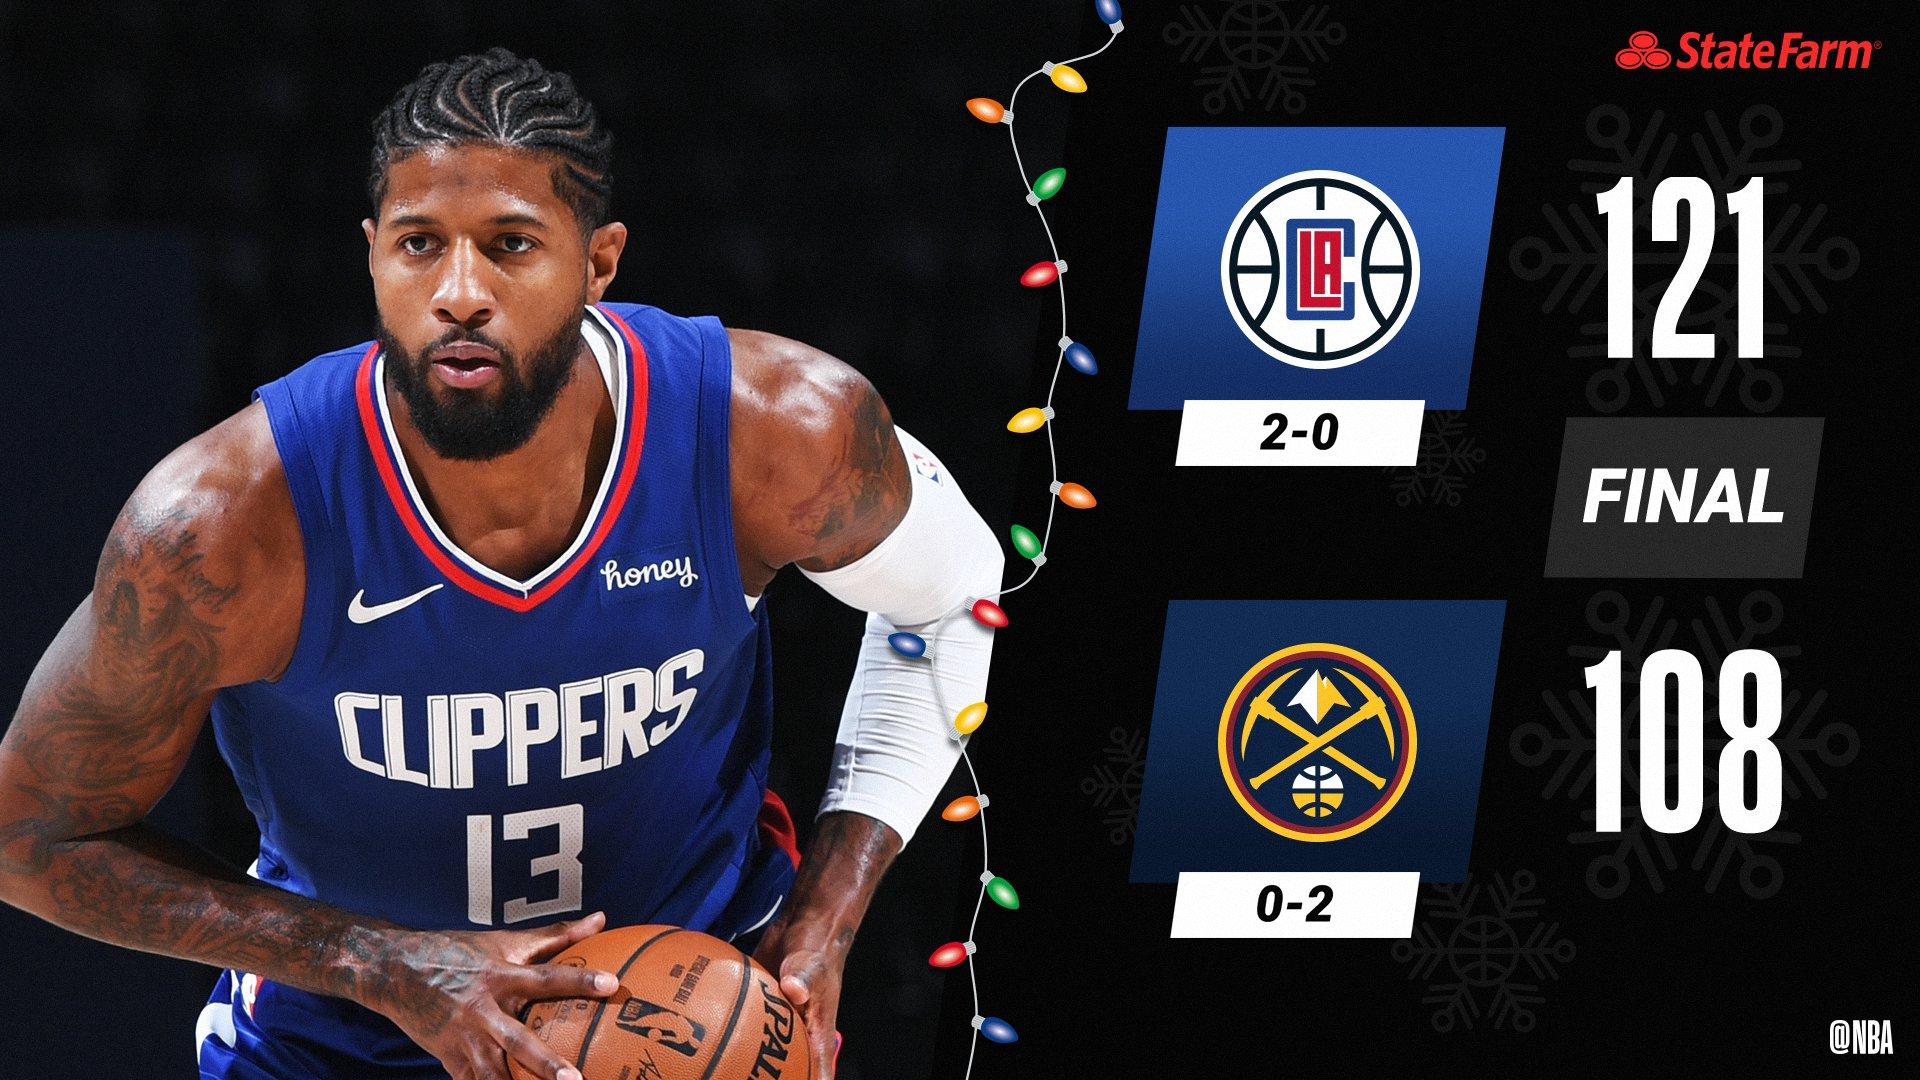 26-12-3